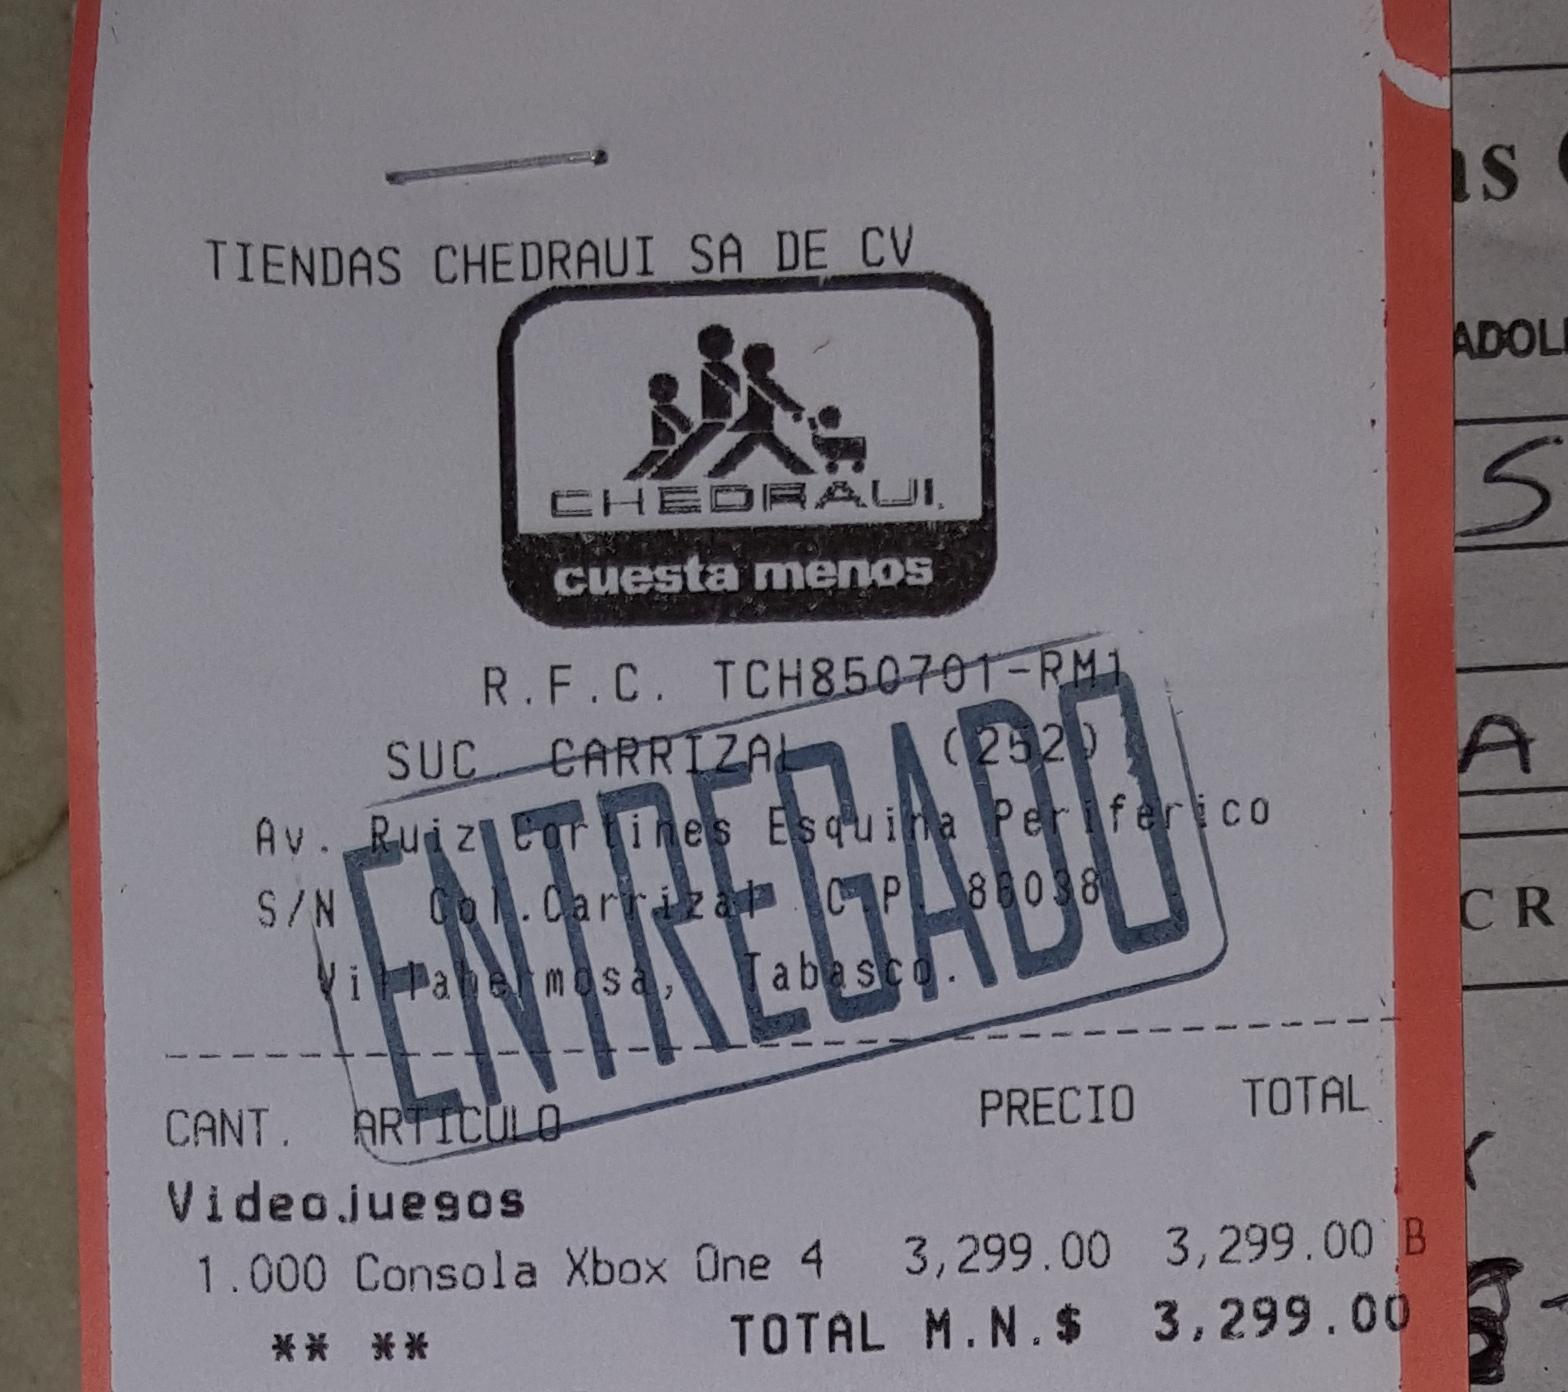 Chedraui (Villahermosa): Xbox One 500Gb Fifa 15 $3,299